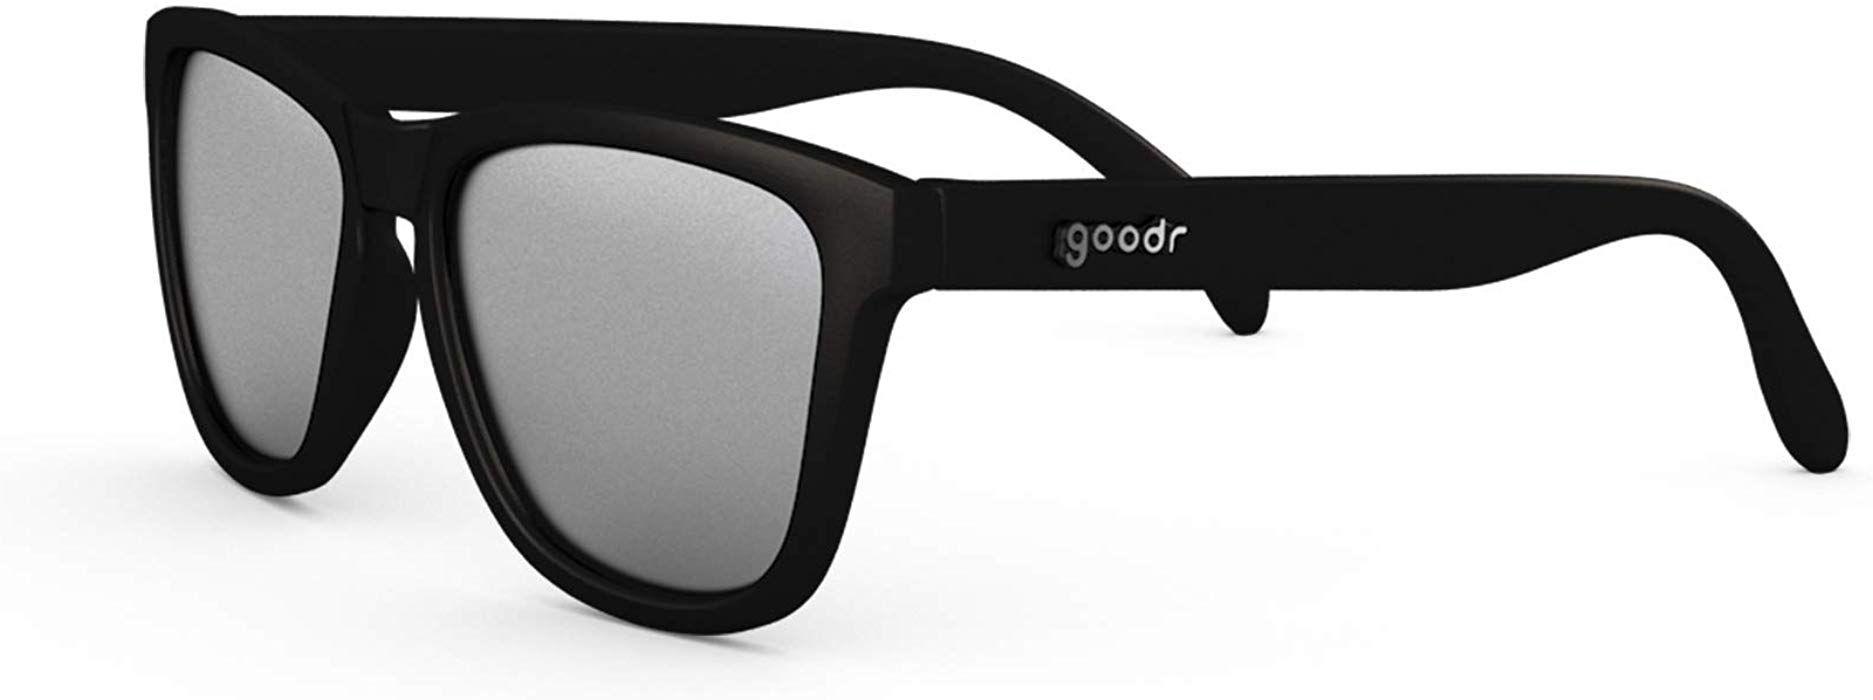 9c350f5a72a goodr OG Sunglasses - (no slip